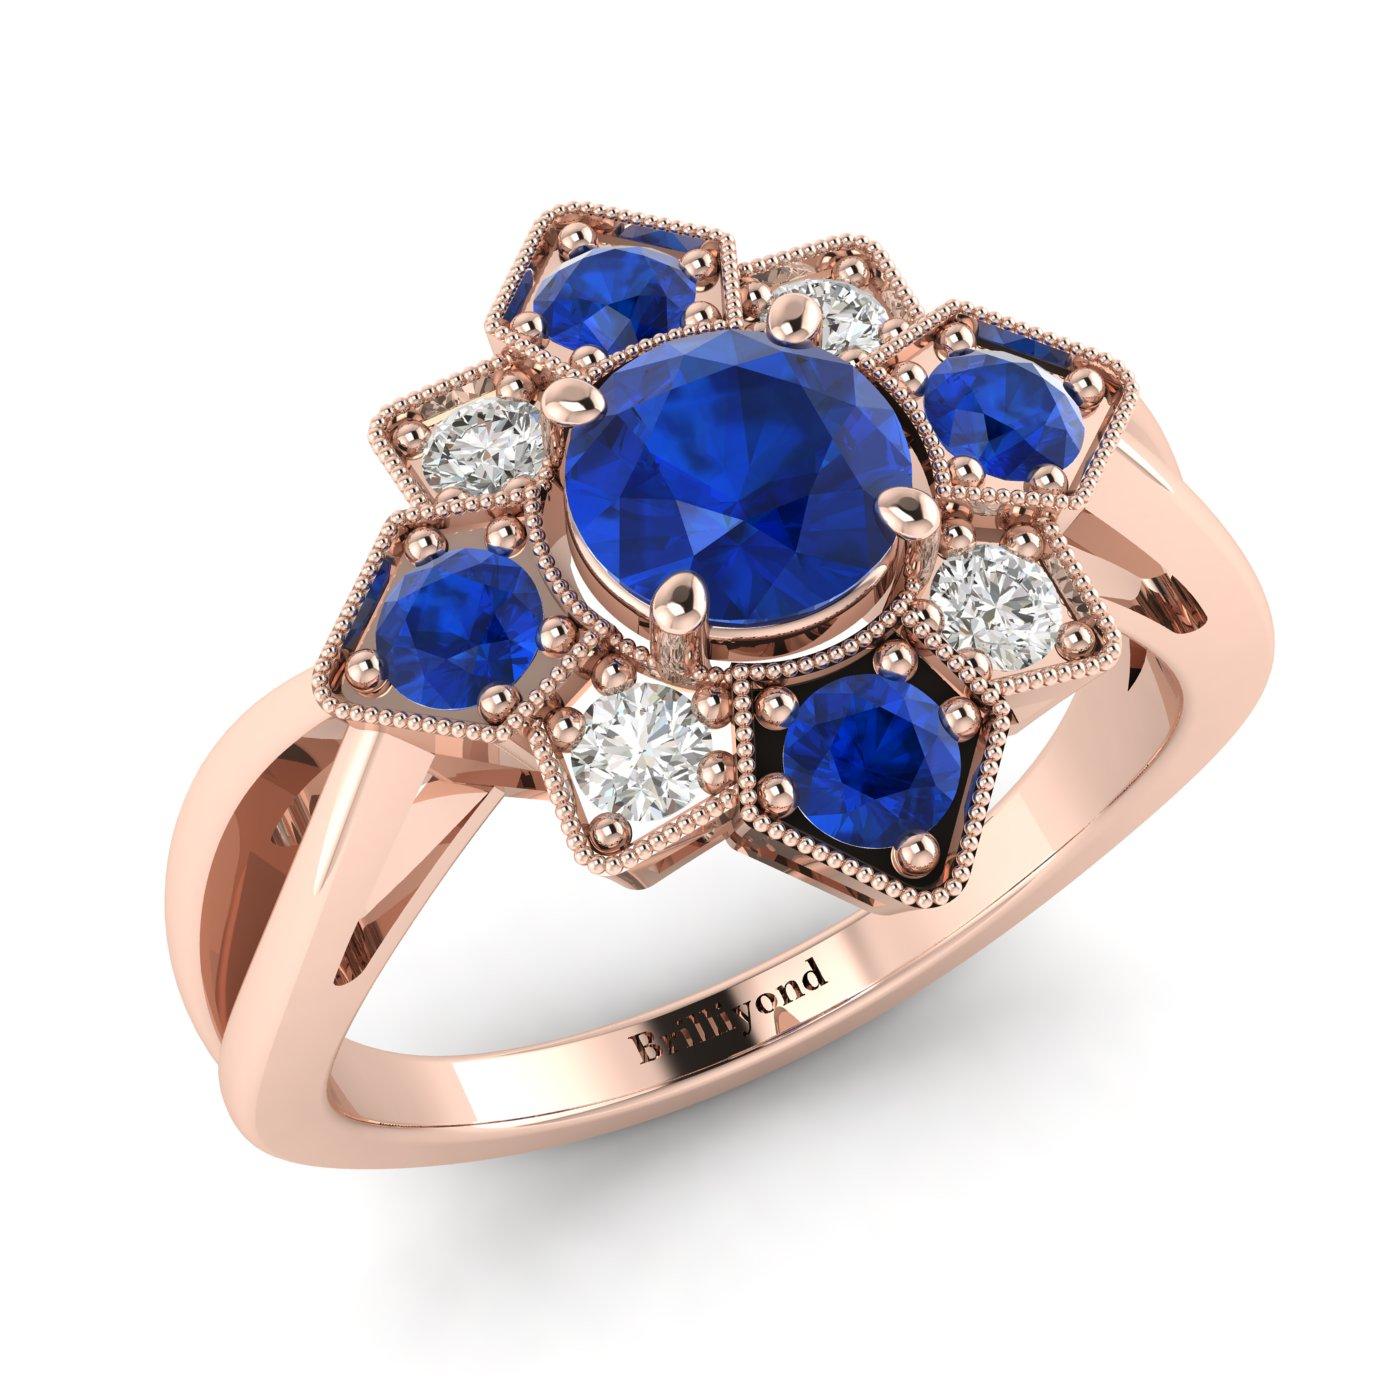 Blue Sapphire Rose Gold Cluster Engagement Ring Madonna_image1